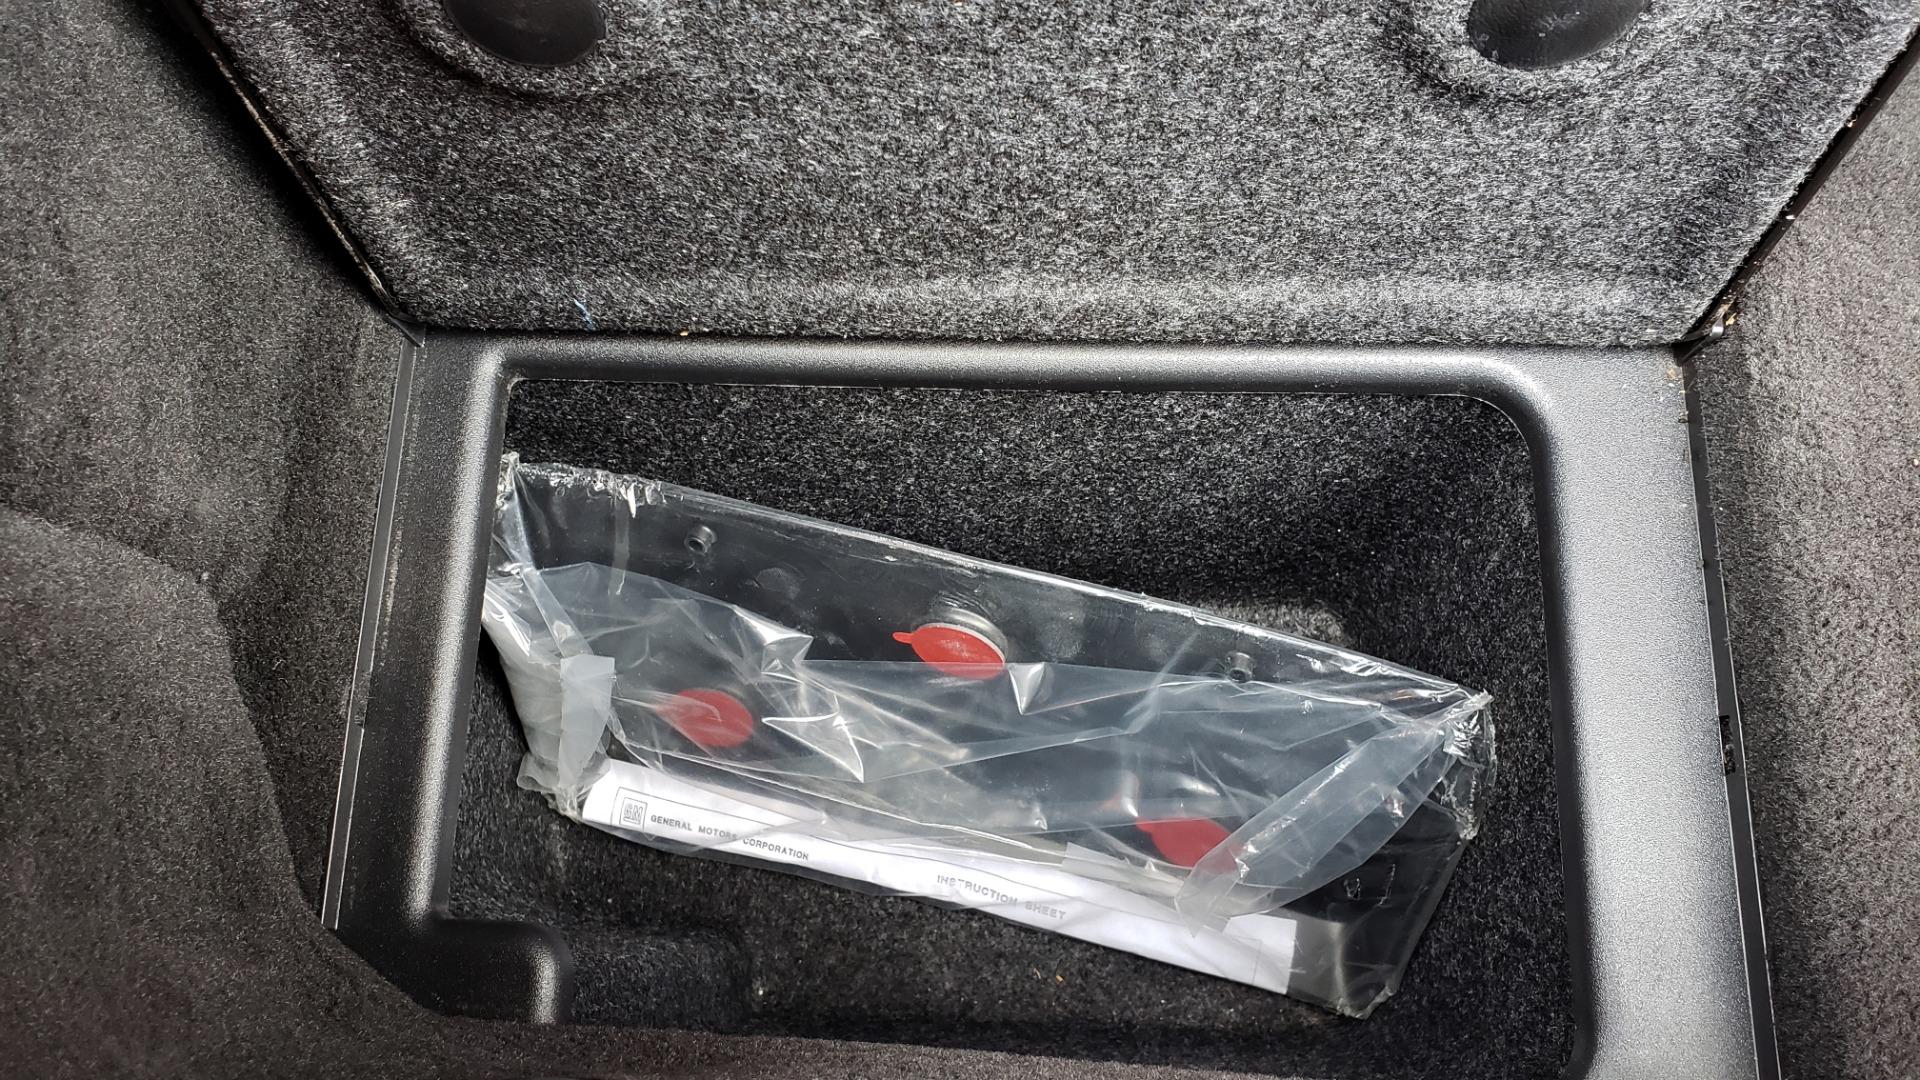 Used 2007 Chevrolet CORVETTE Z06 2LZ / 7.0L 427 V8 / 6-SPD MAN / BOSE / POLISHED WHEELS for sale Sold at Formula Imports in Charlotte NC 28227 37